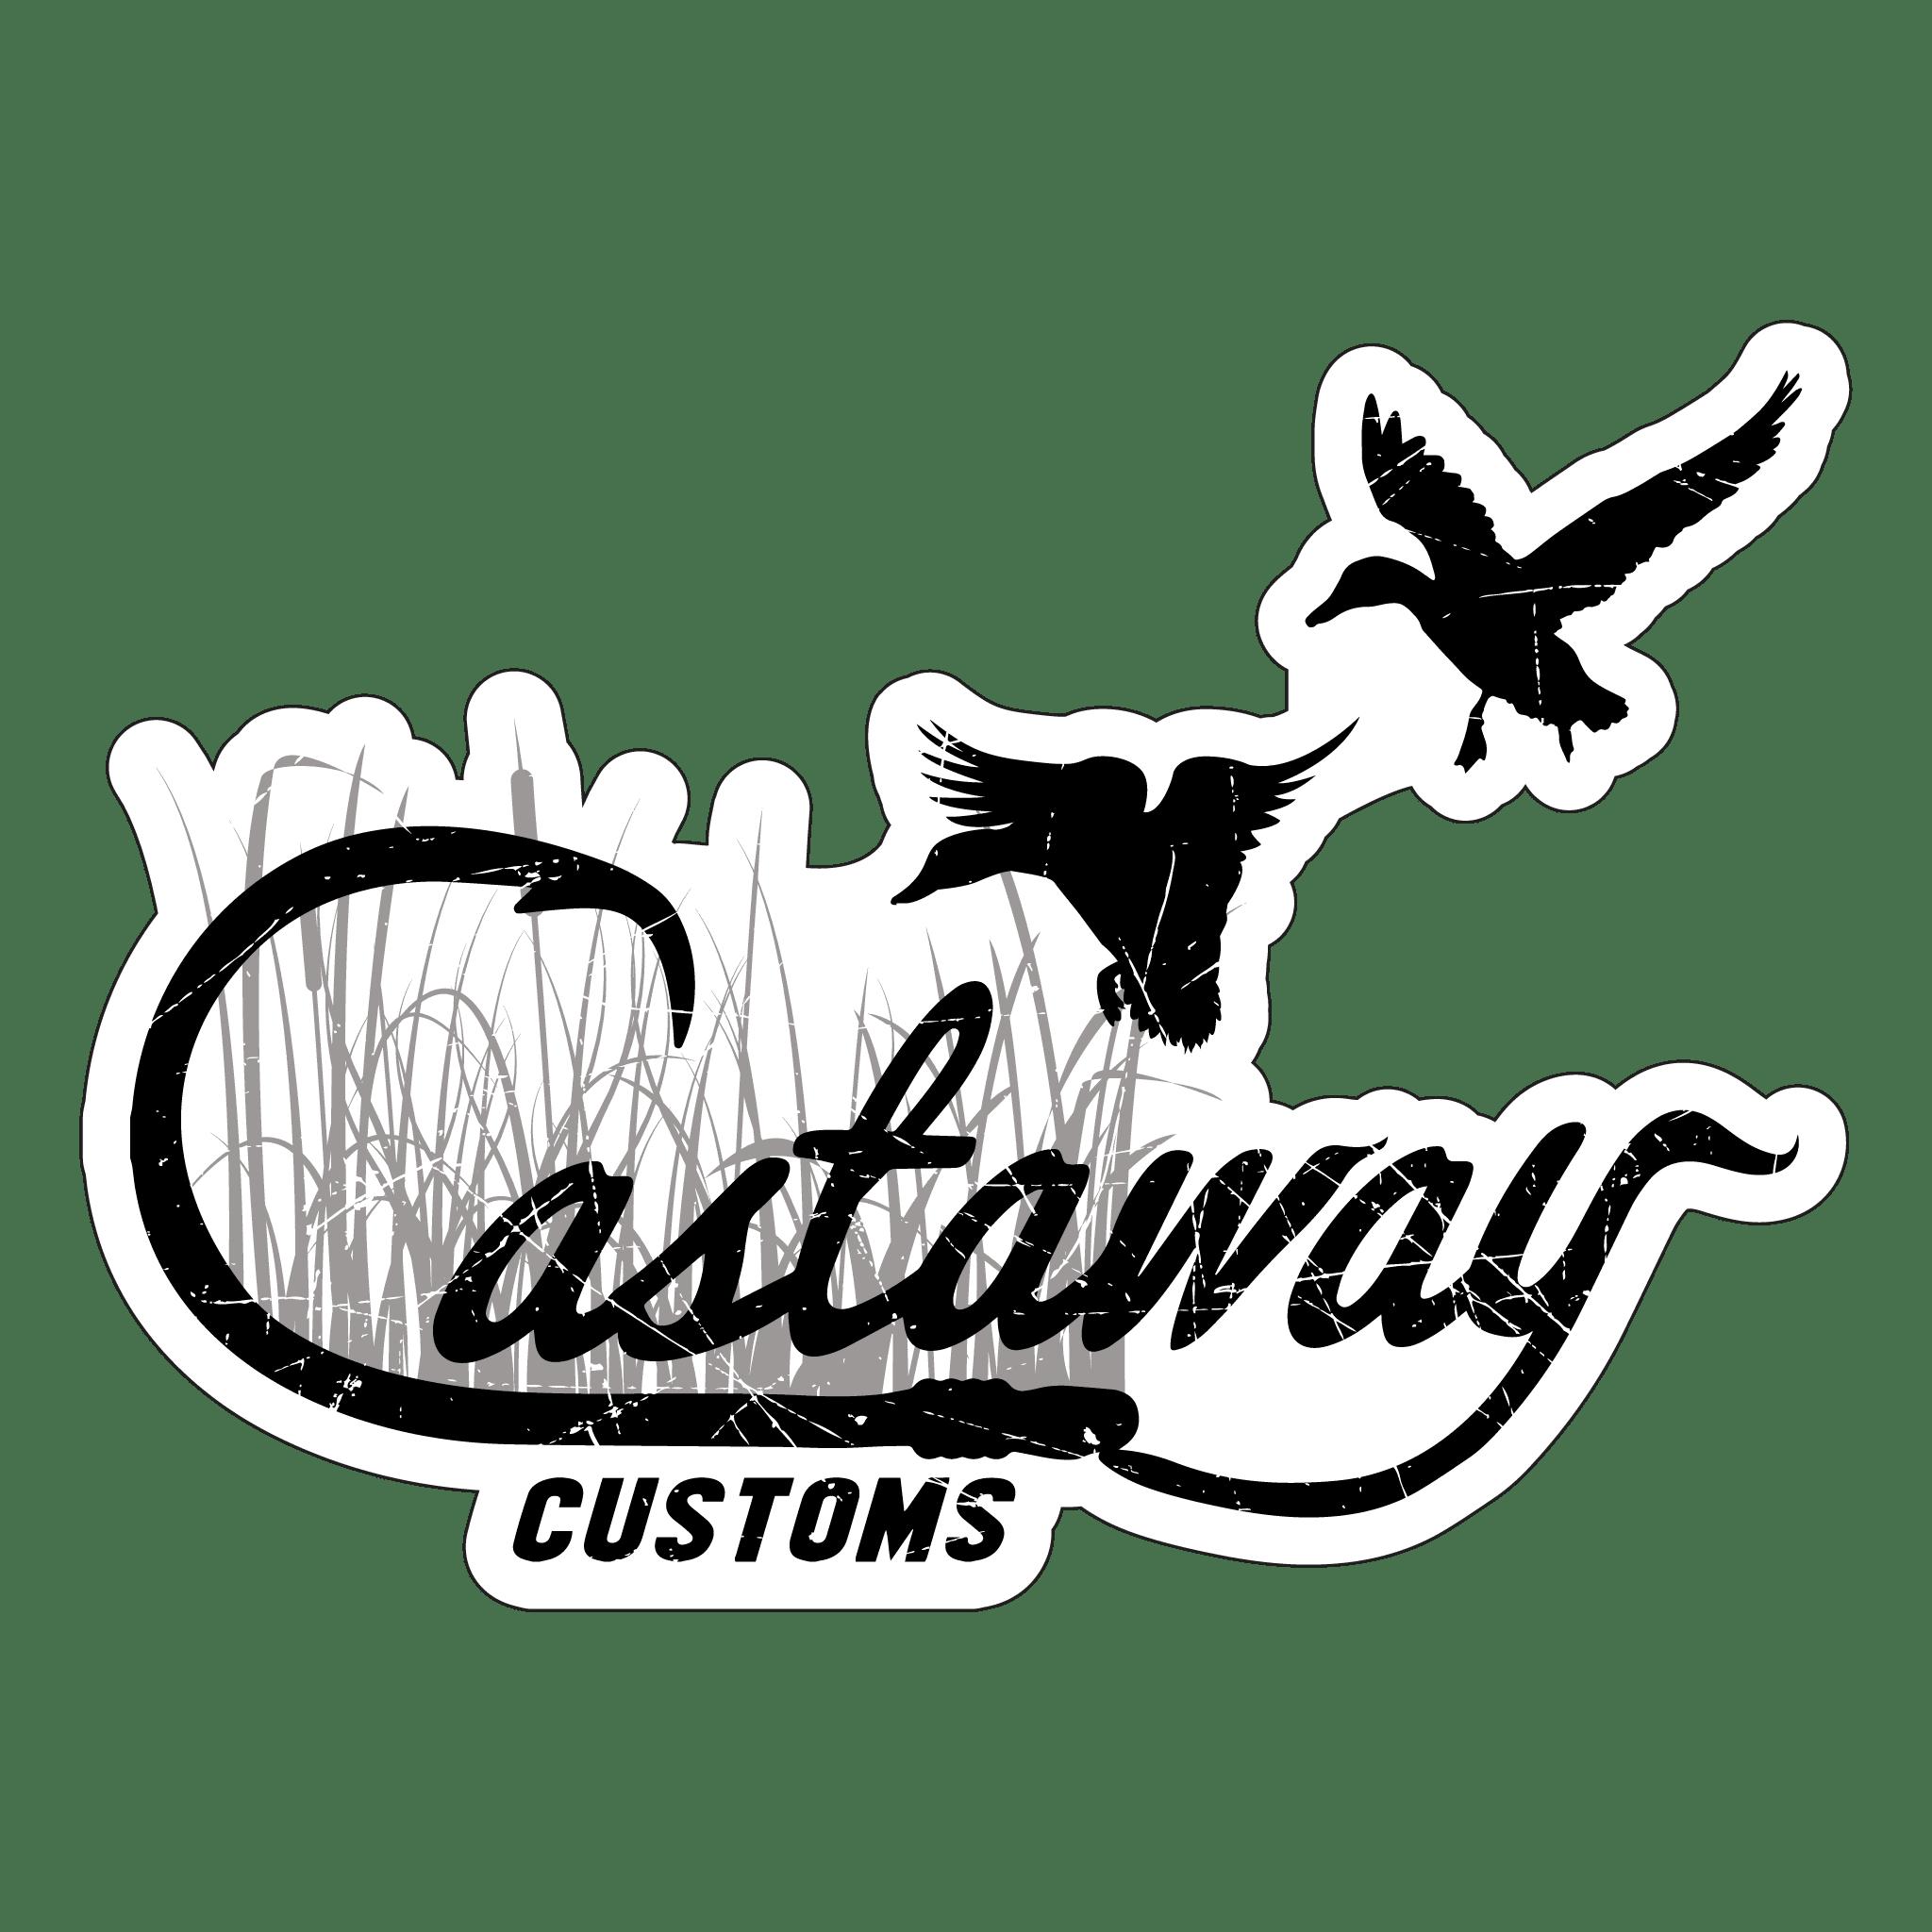 Cast Box Logo: Duck Logo Decal